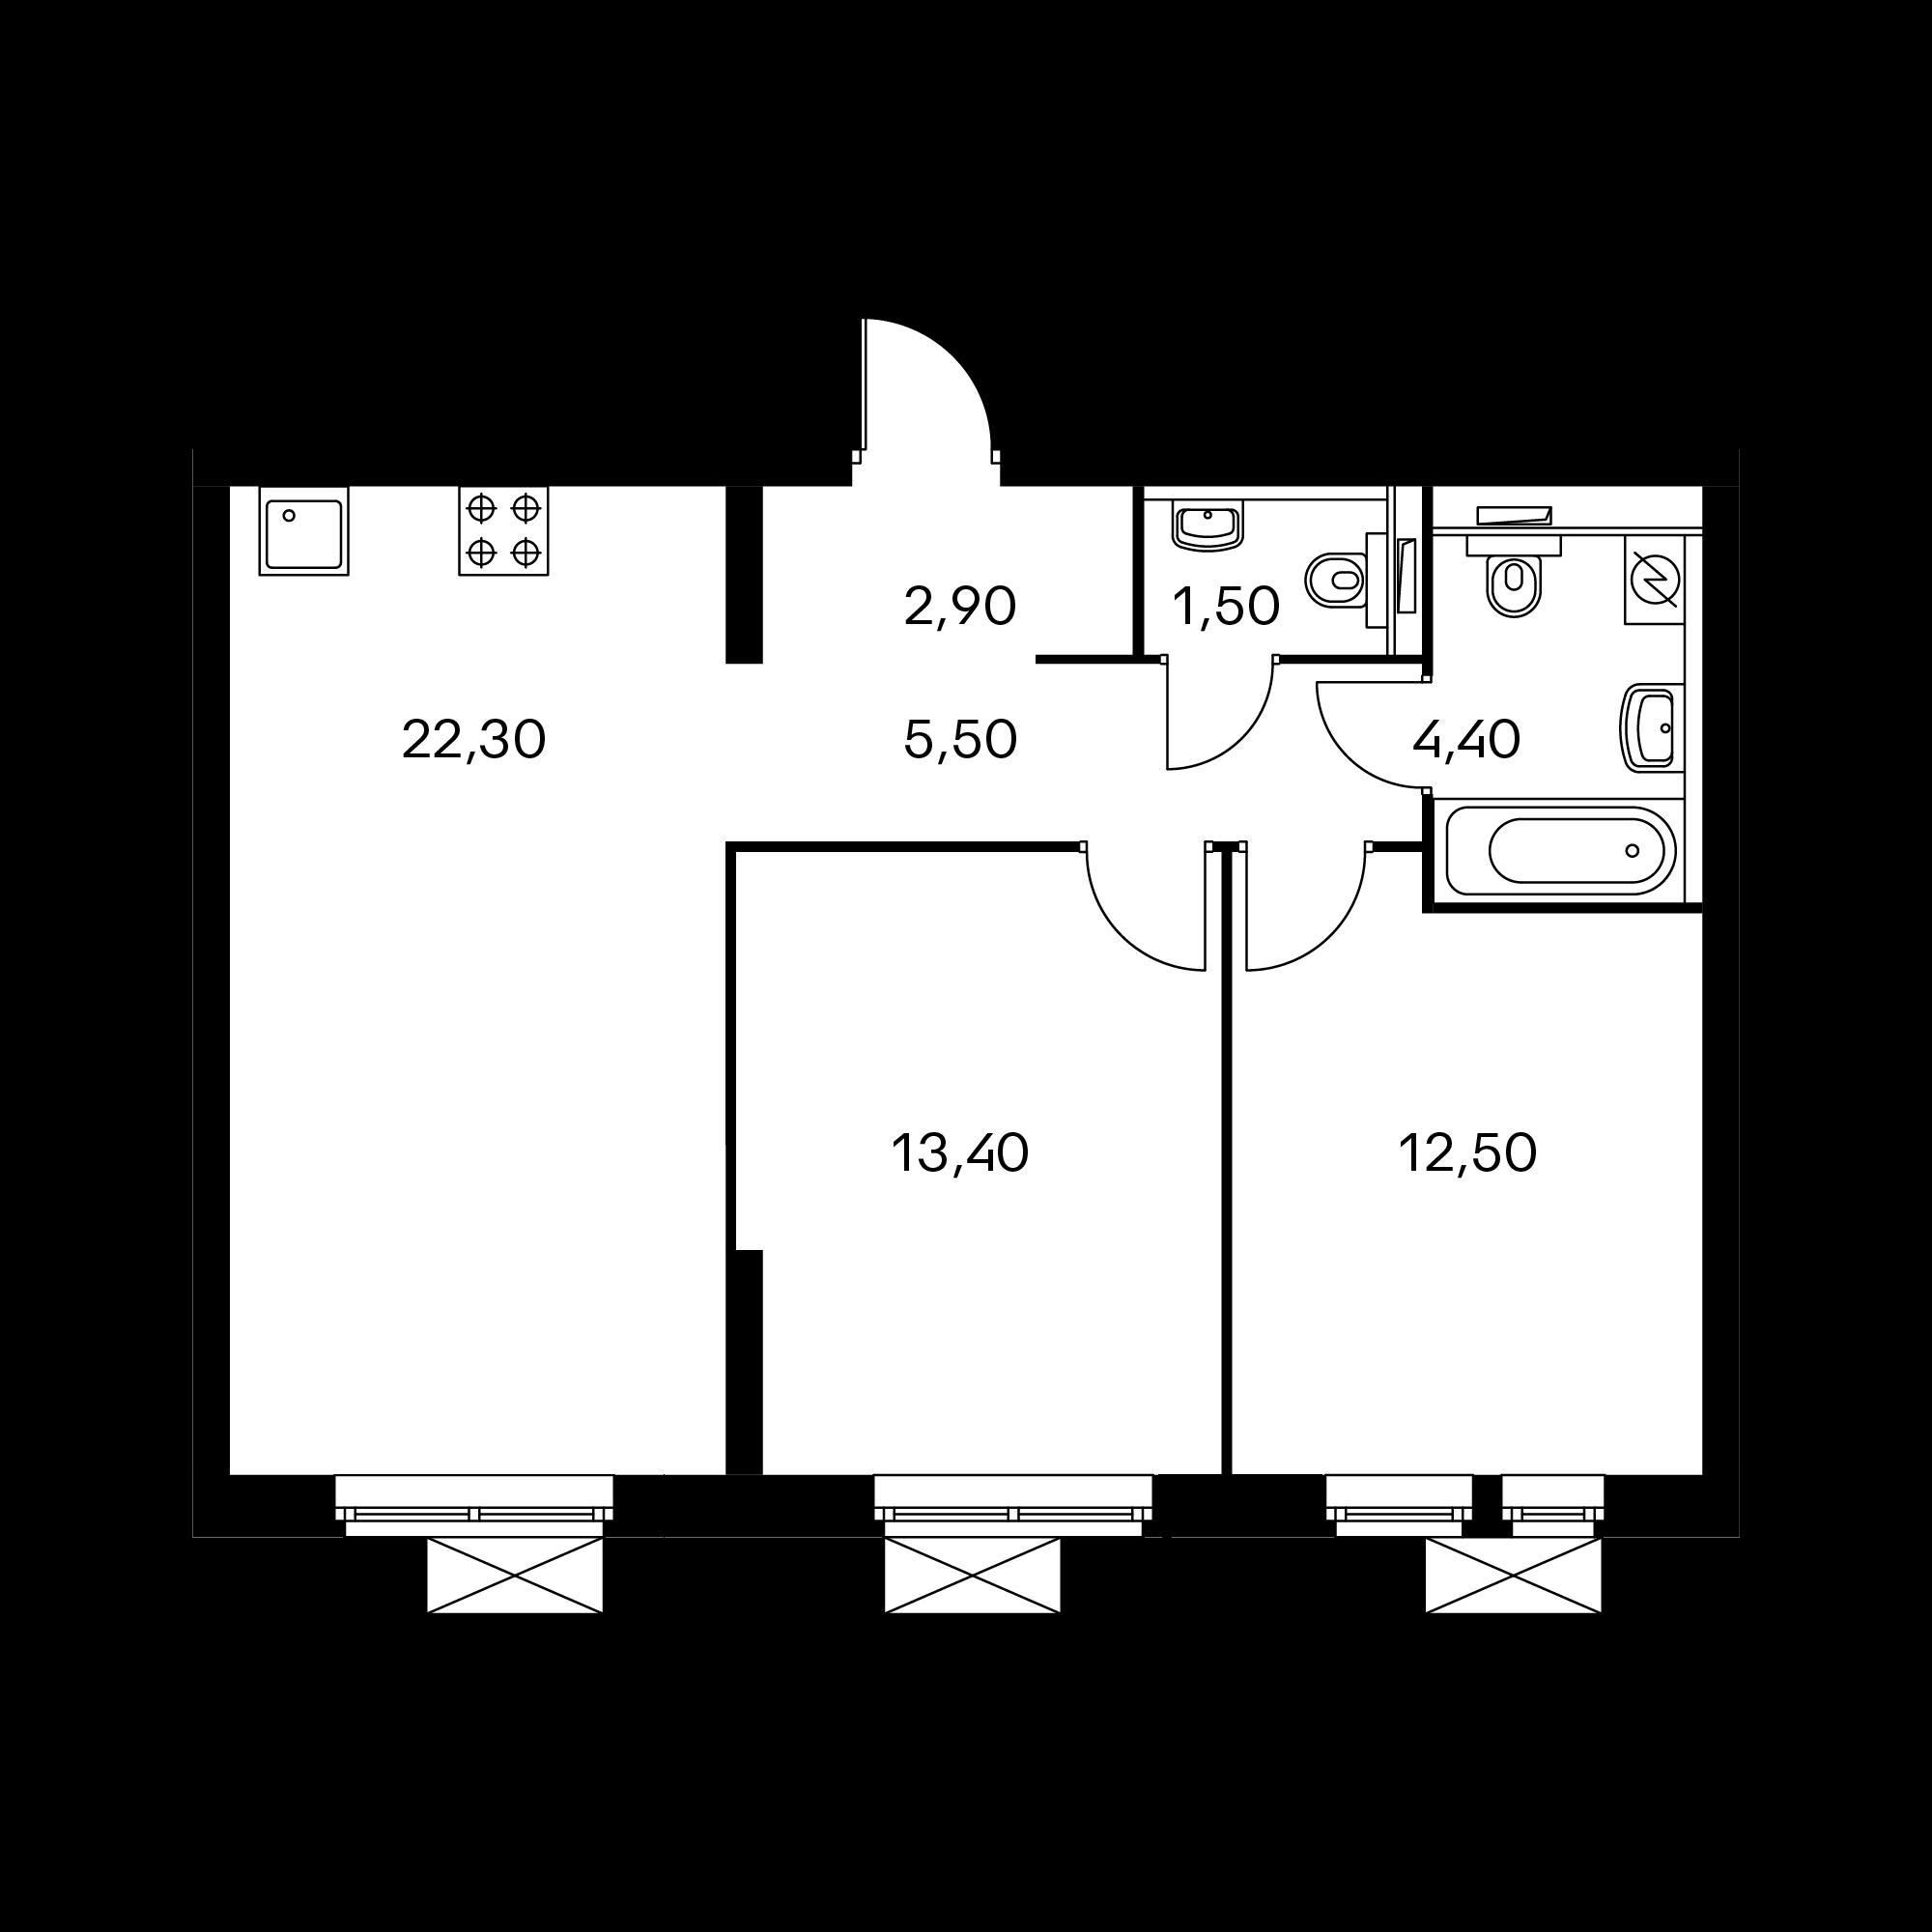 2EM1_10.2-1